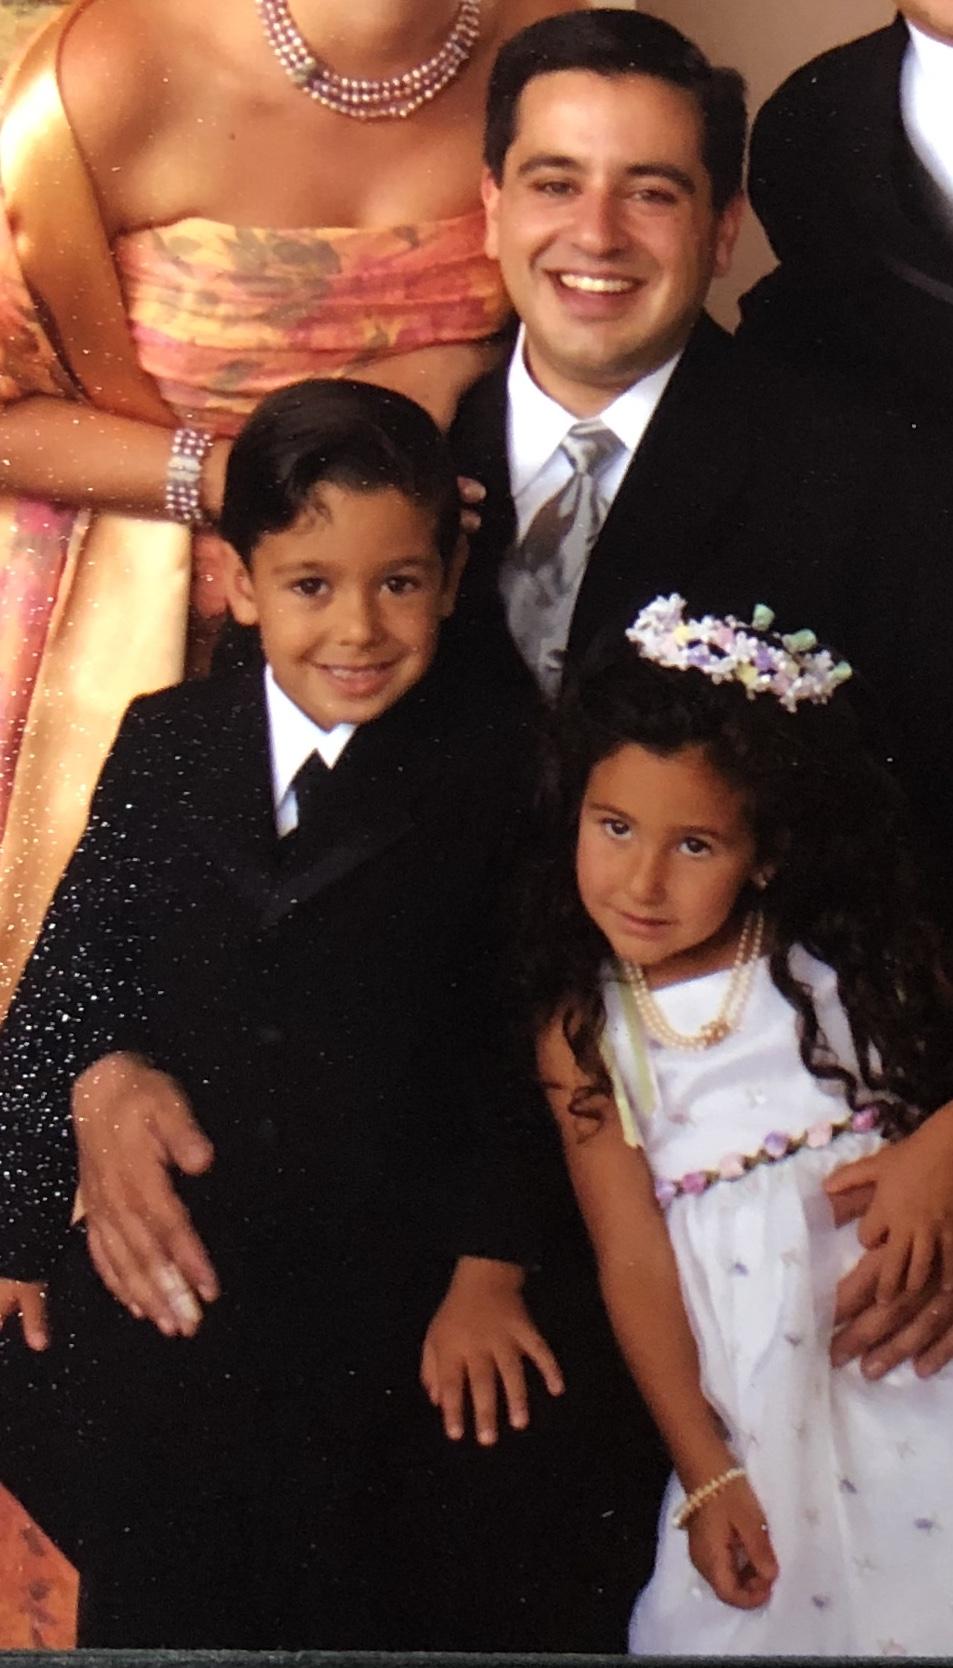 Alexandra and Nicholas